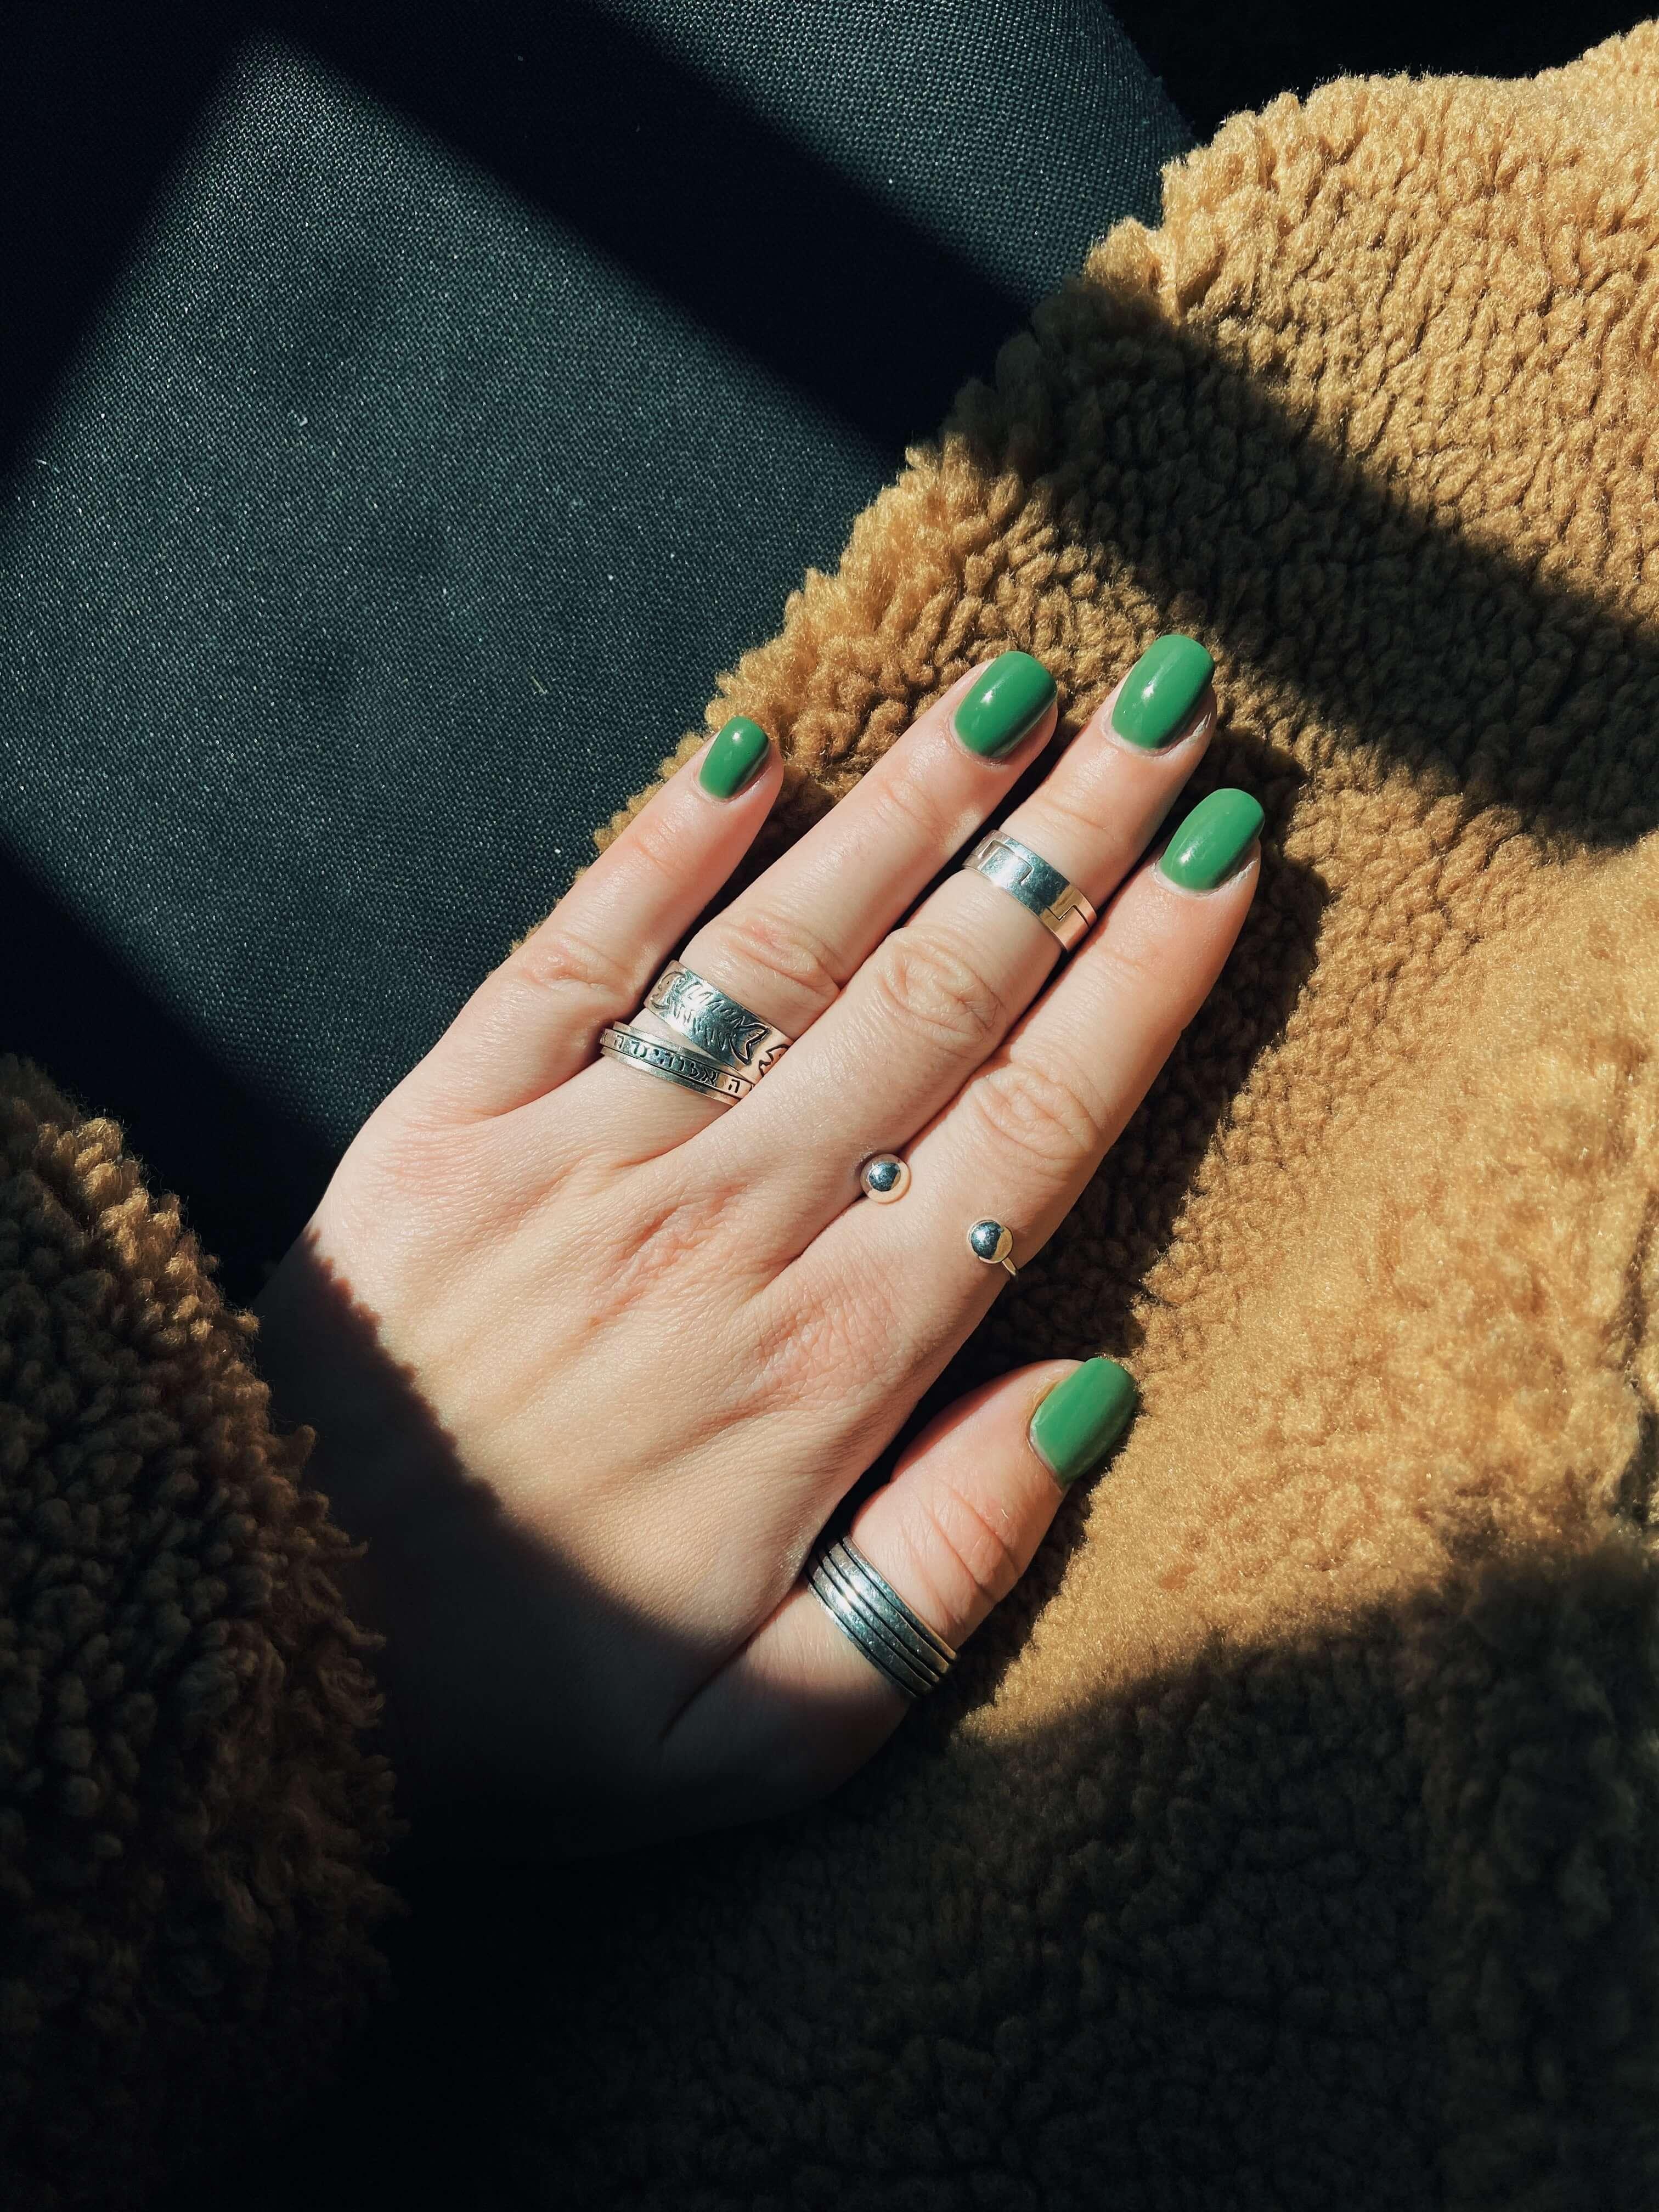 Best toe nail polish color